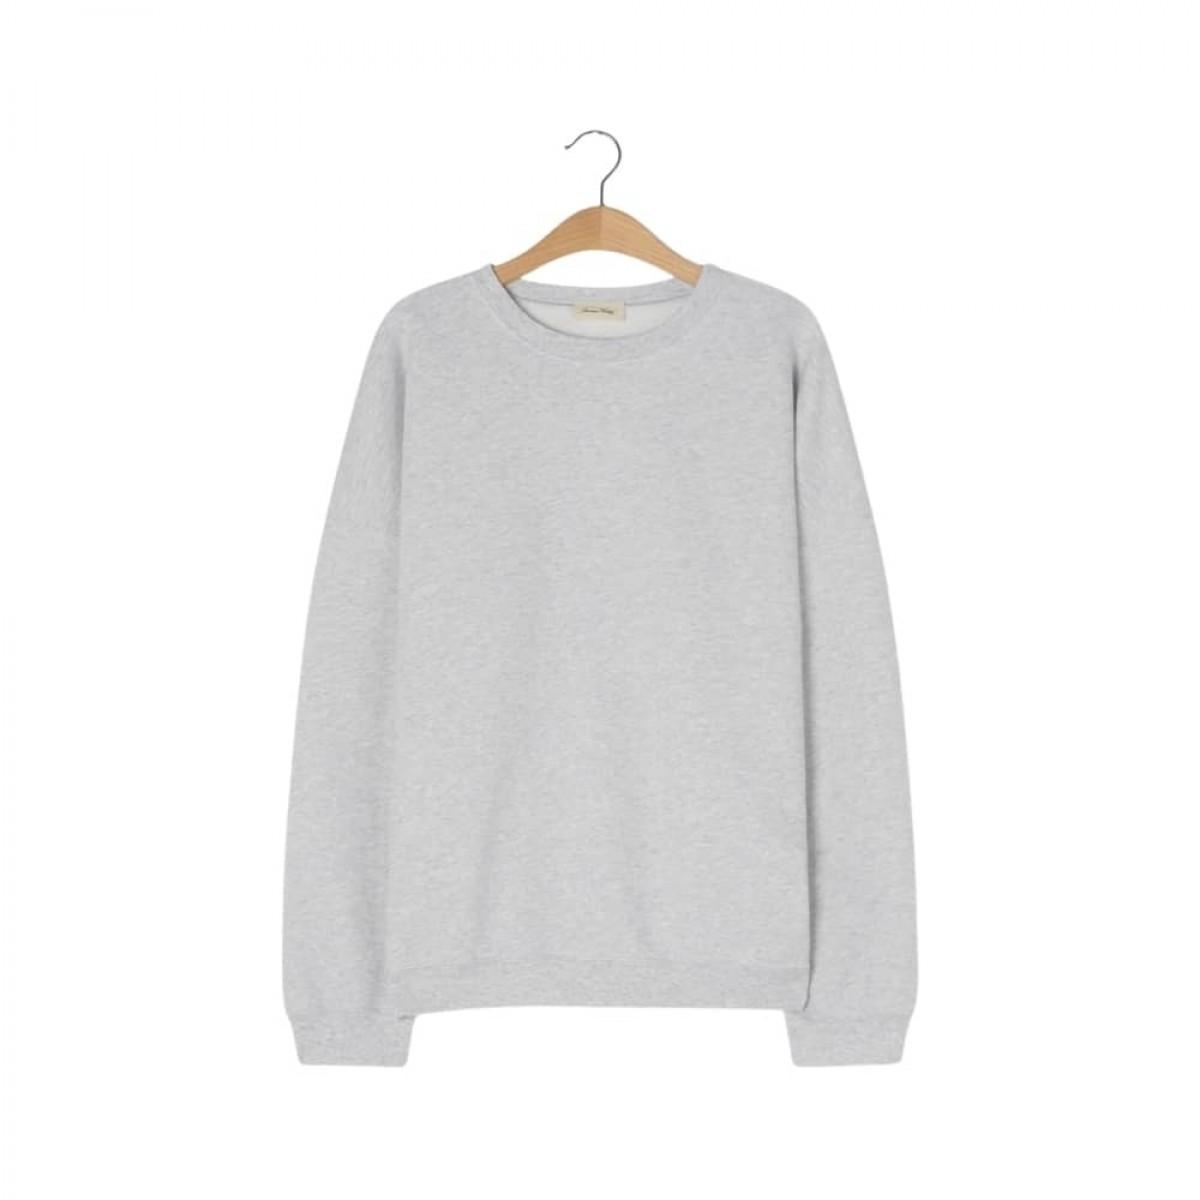 baetown sweat - light heather grey